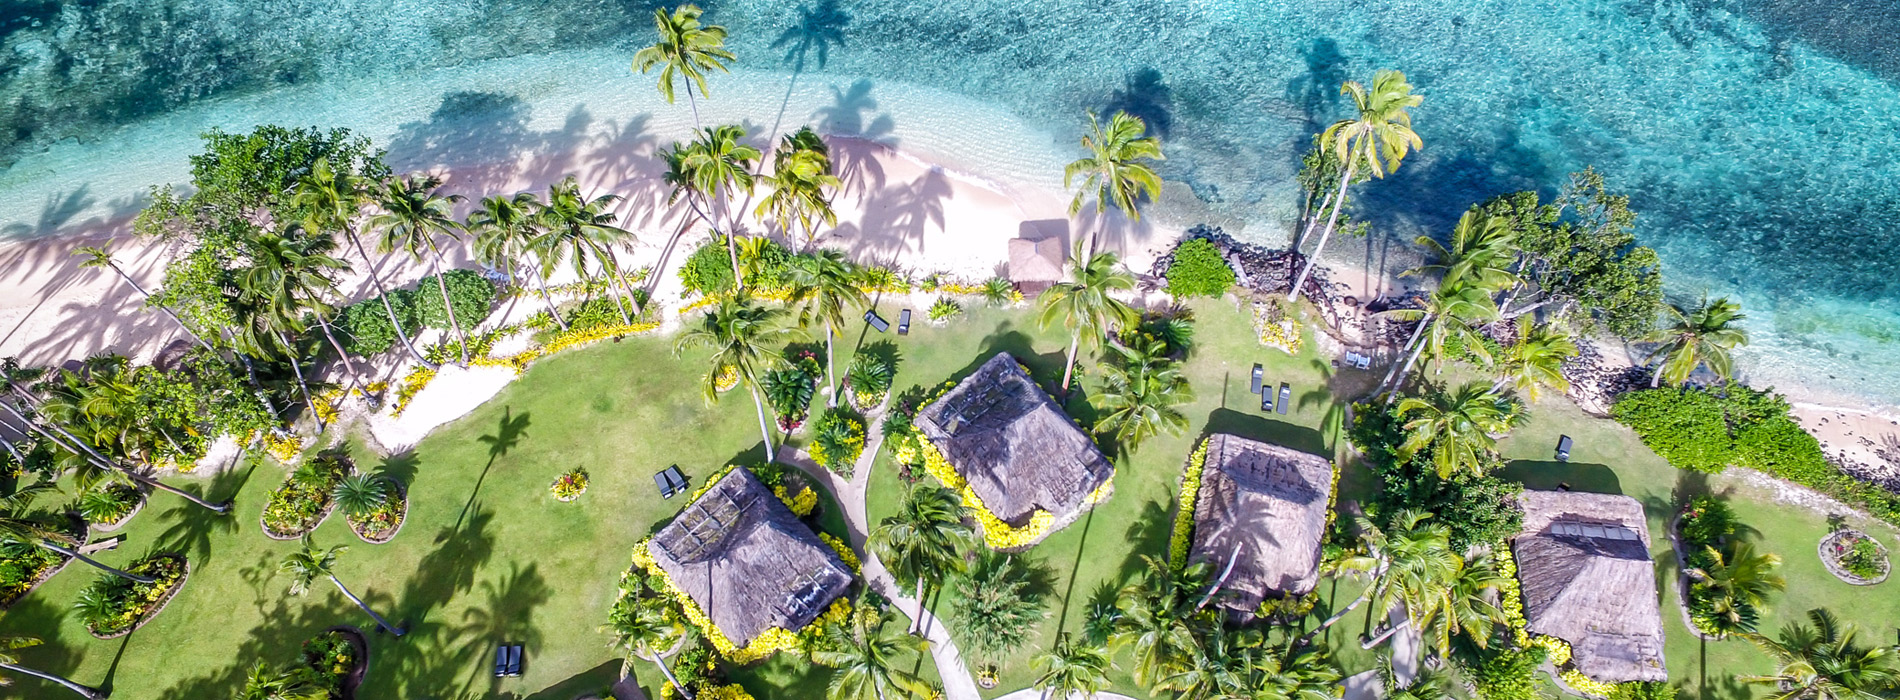 qamea resort fiji travel review